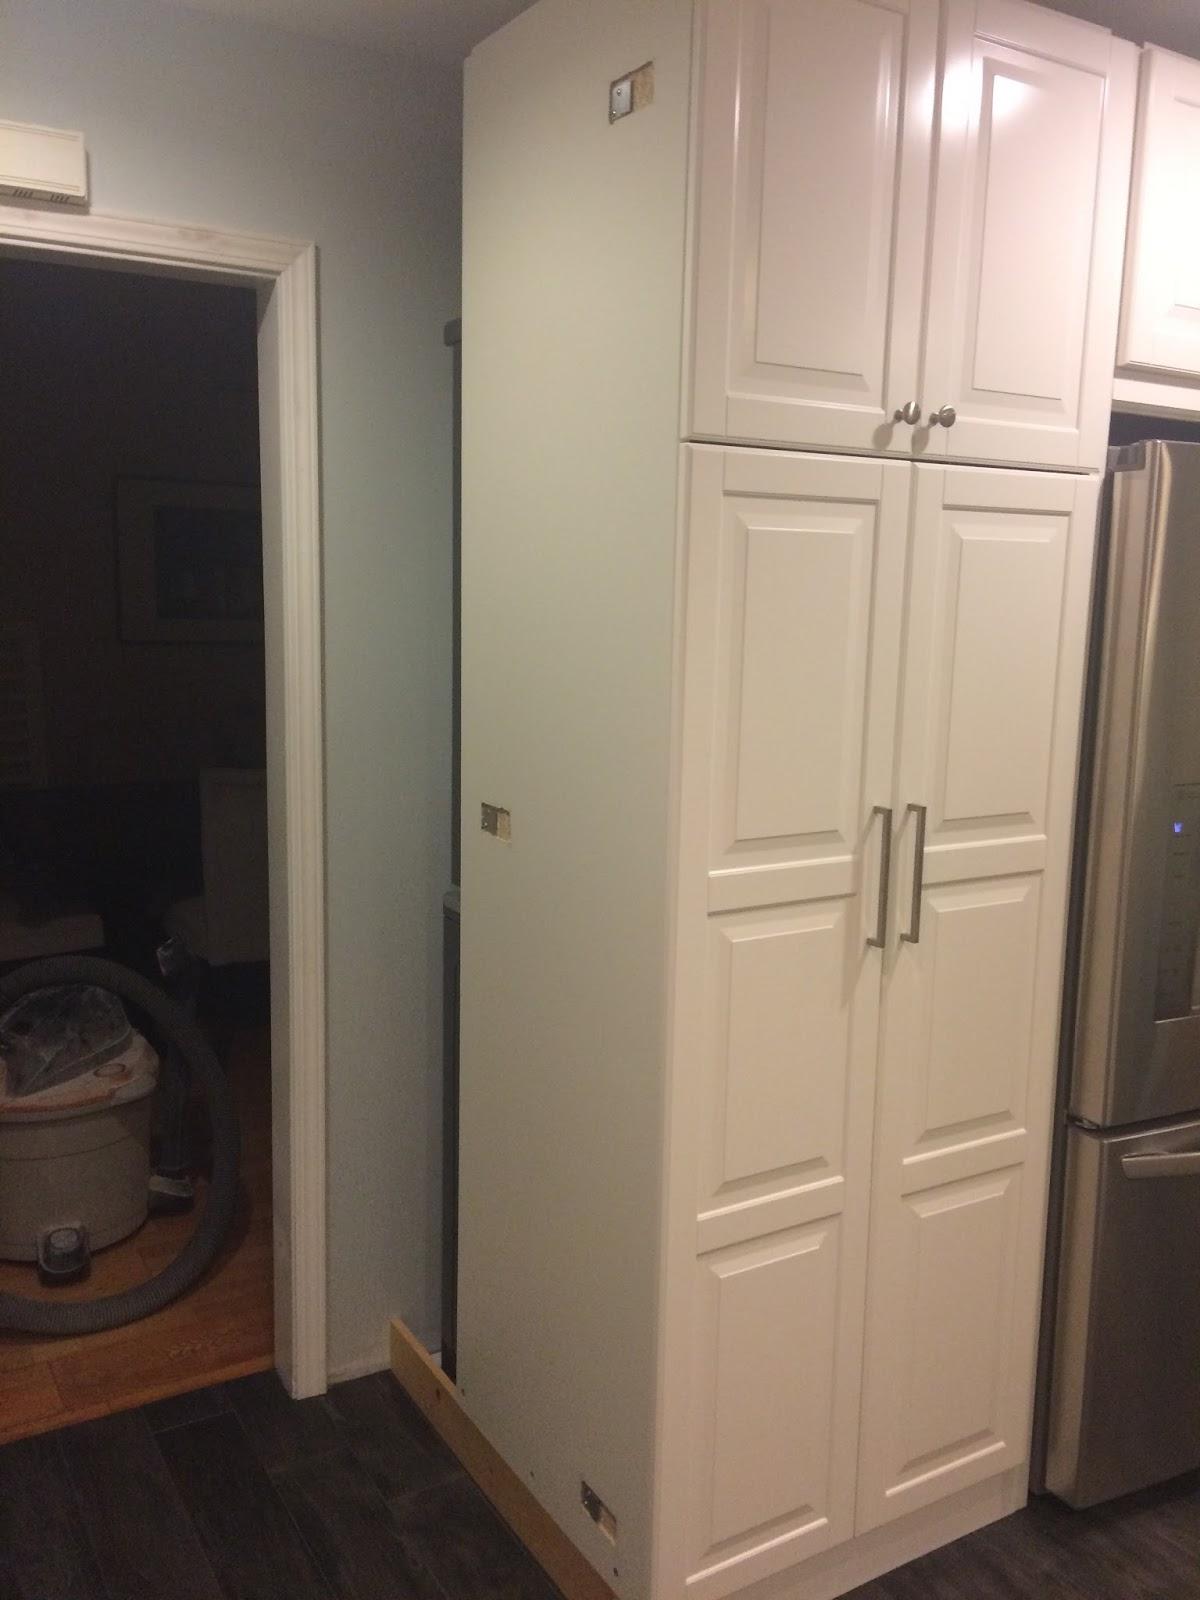 The Allison's First Home: Washer Dryer Ikea Kitchen CabiHack